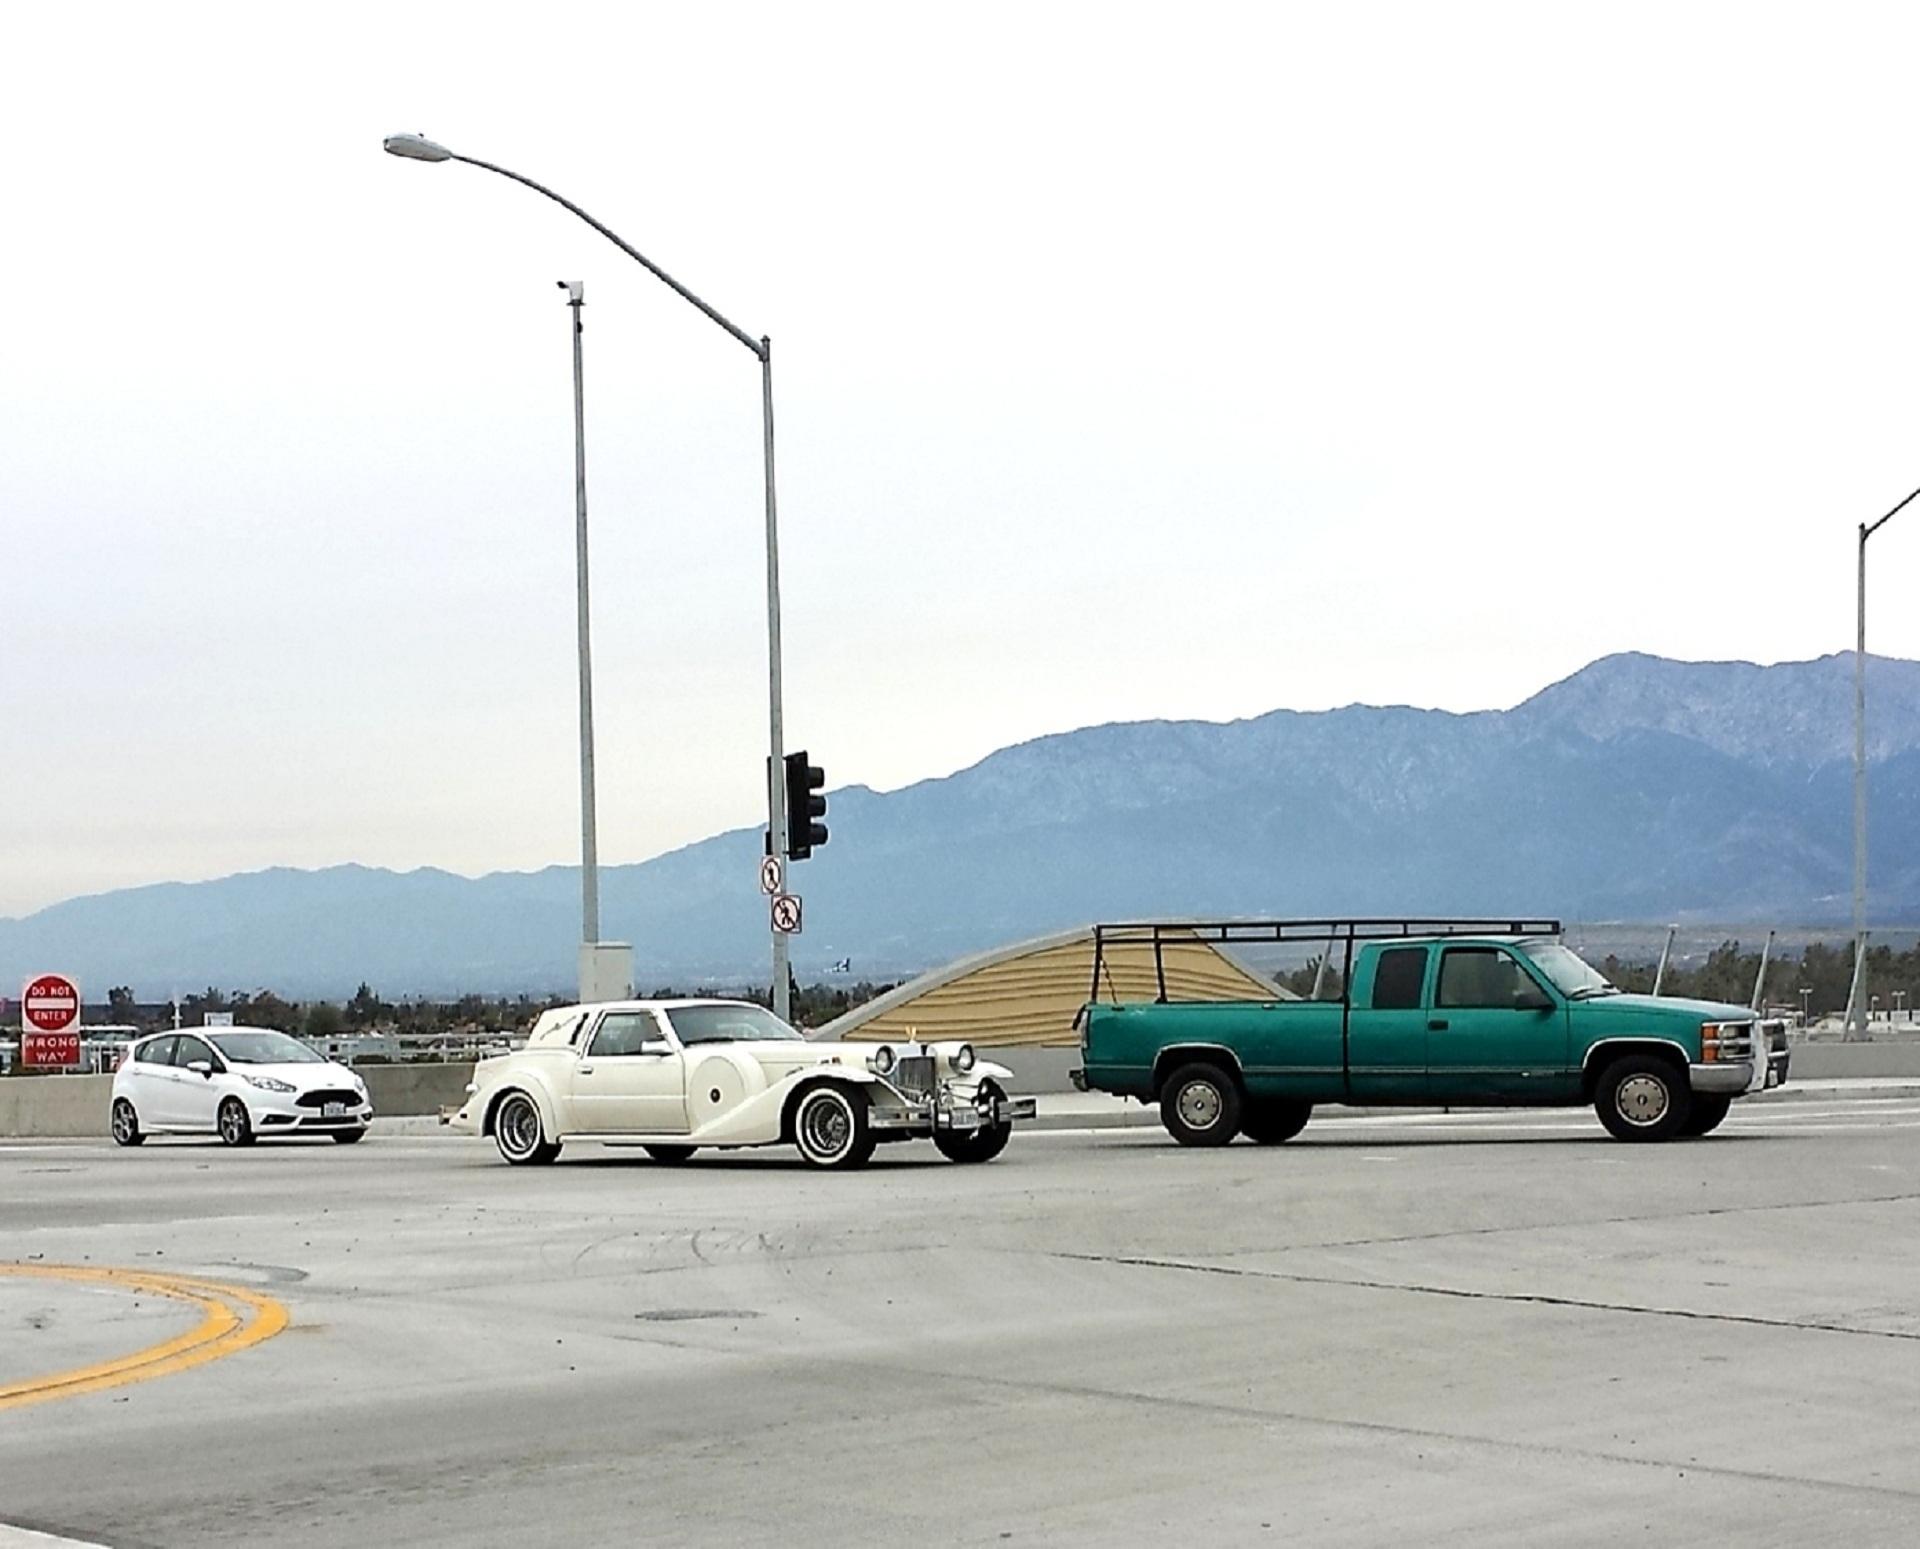 Free Images : road, white, traffic, street, car, vintage, antique ...